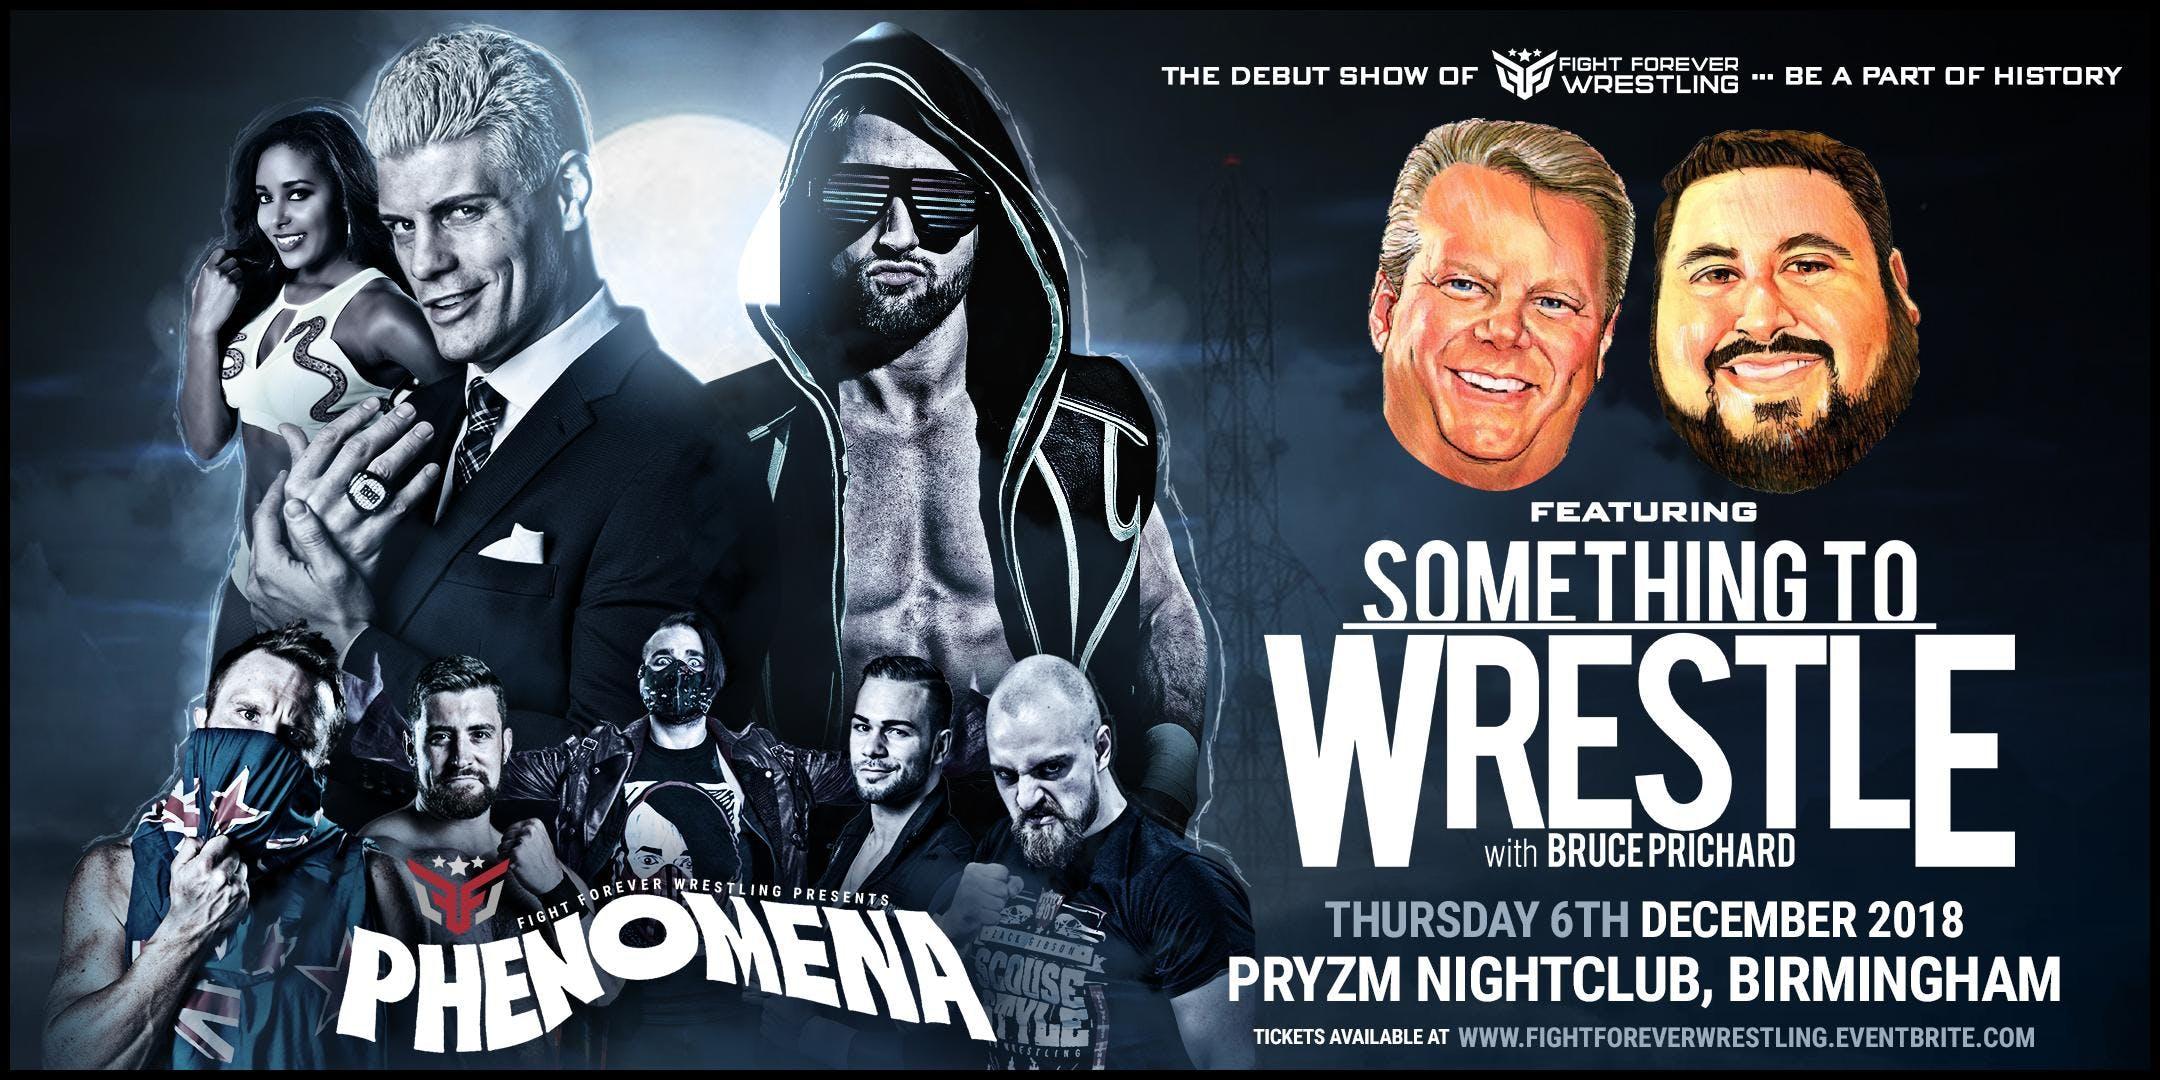 Phenomena feat. Something To Wrestle With Bru